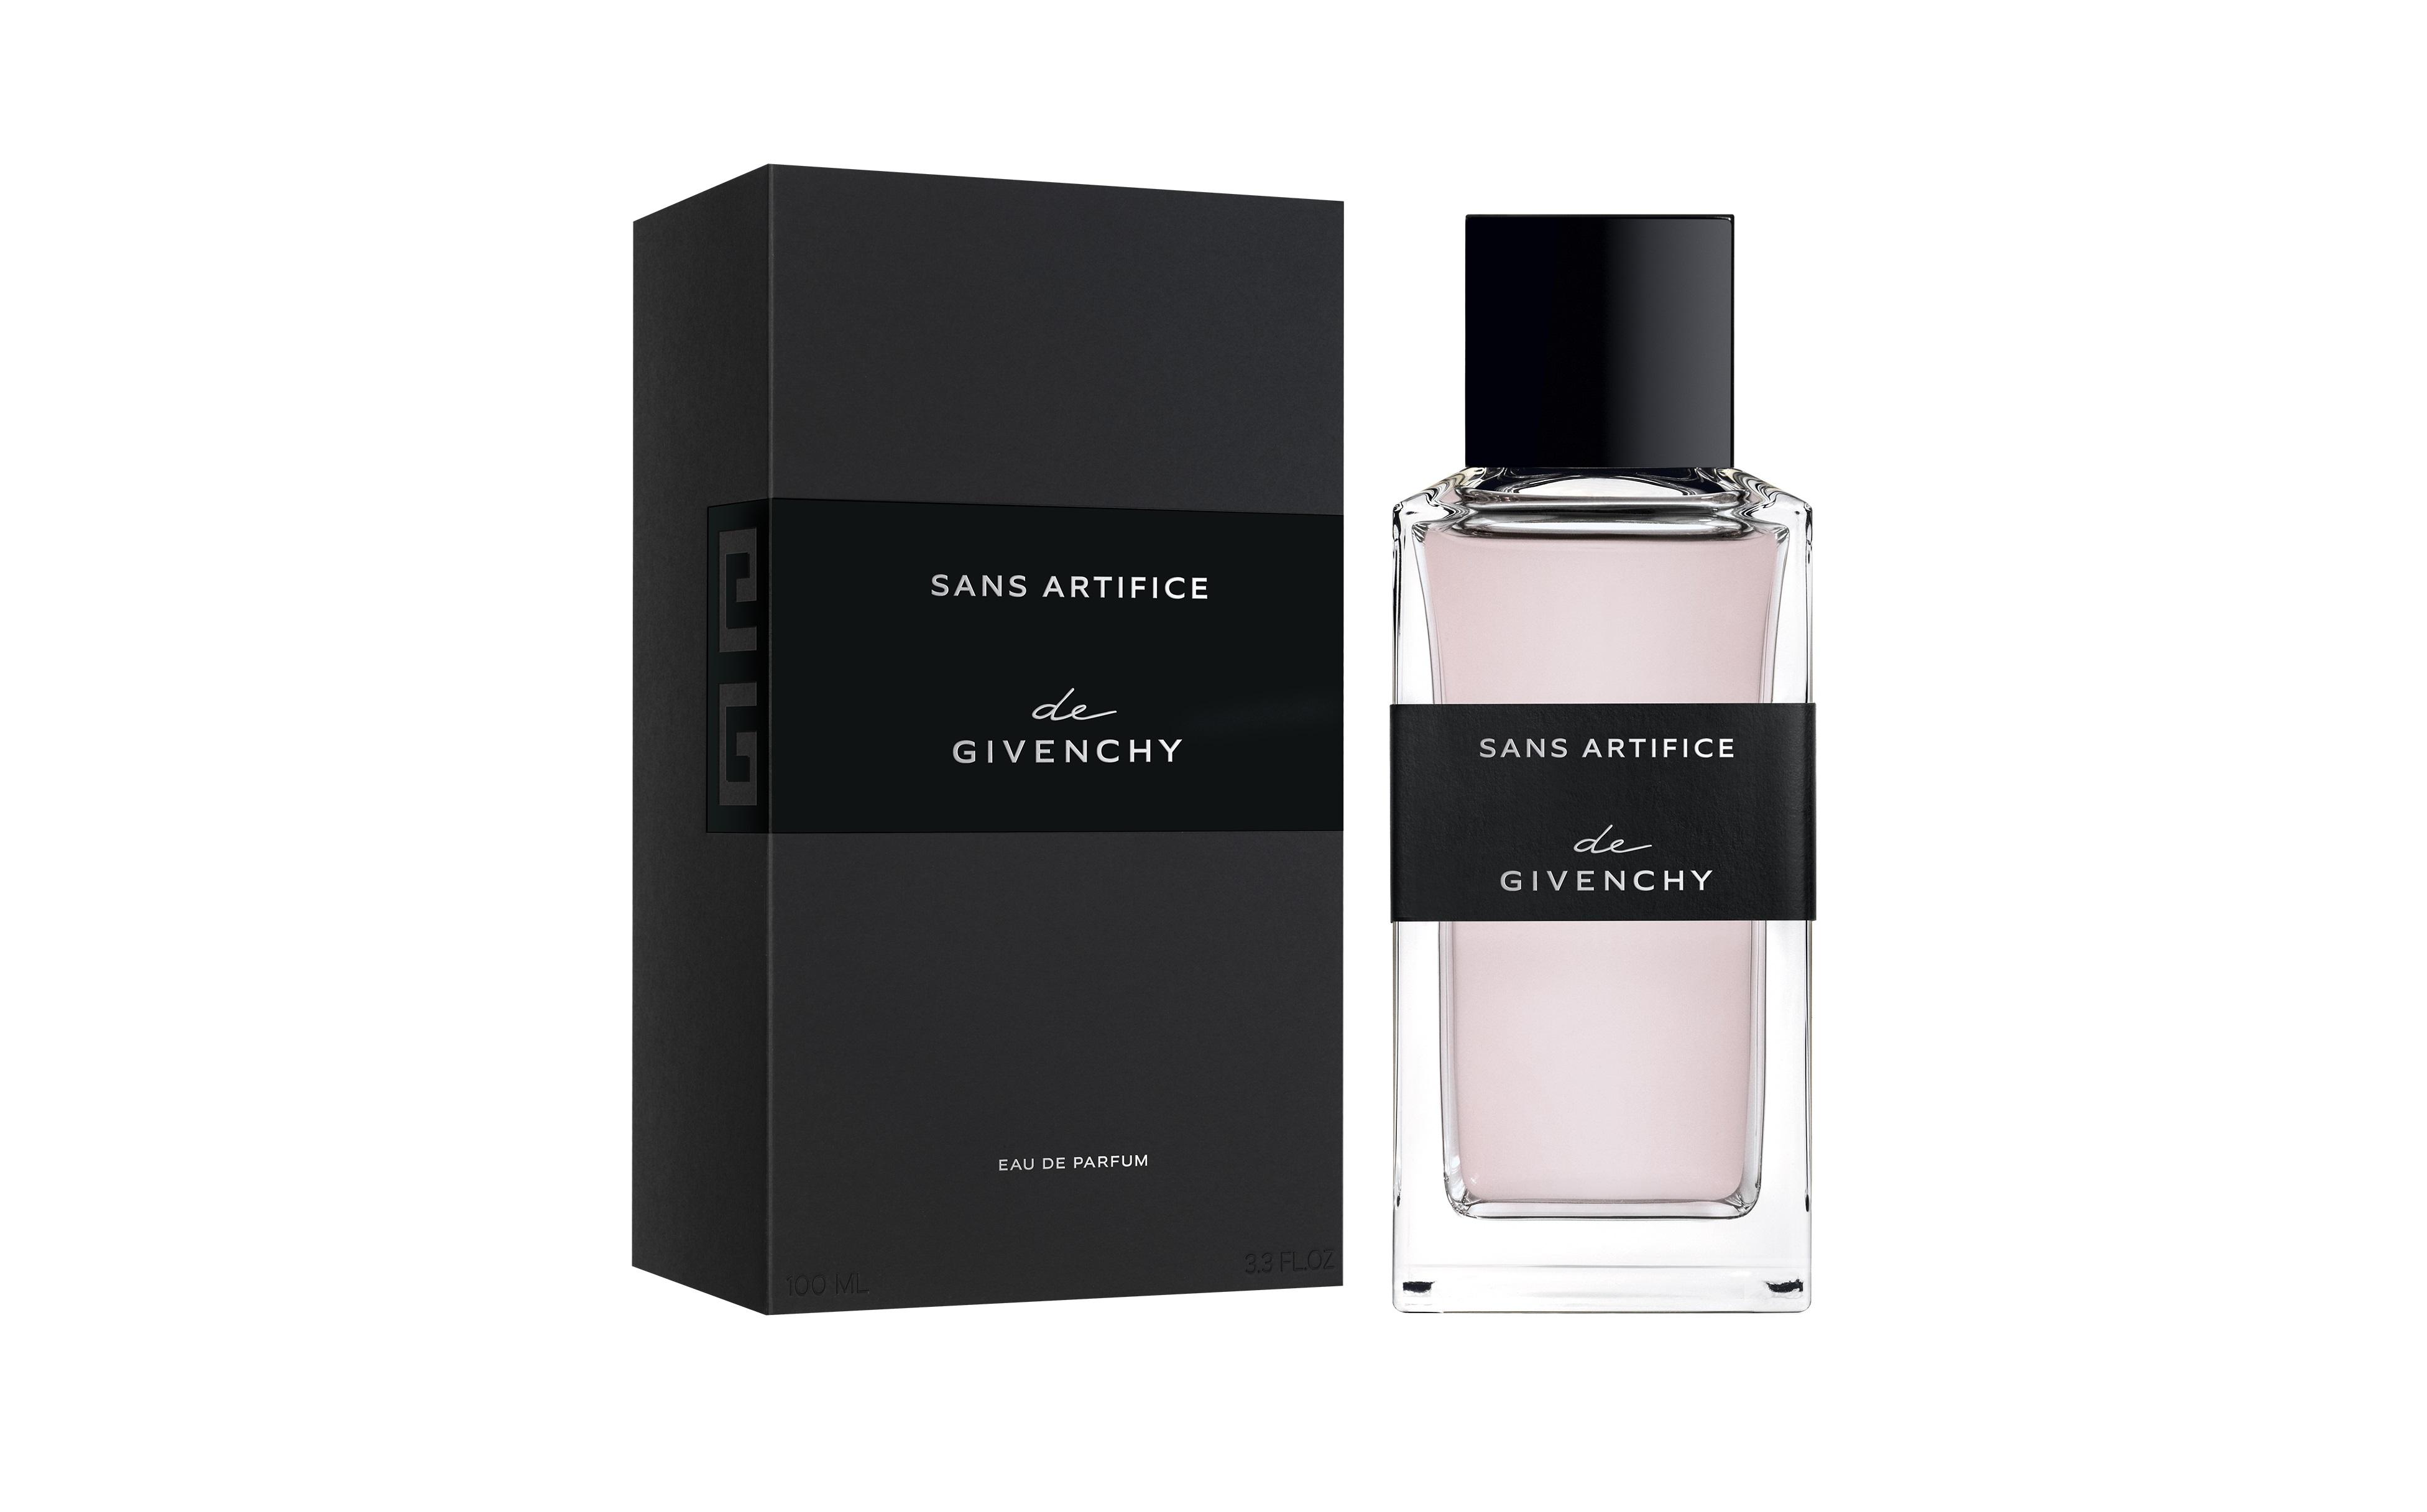 Givenchy Sans Artifice